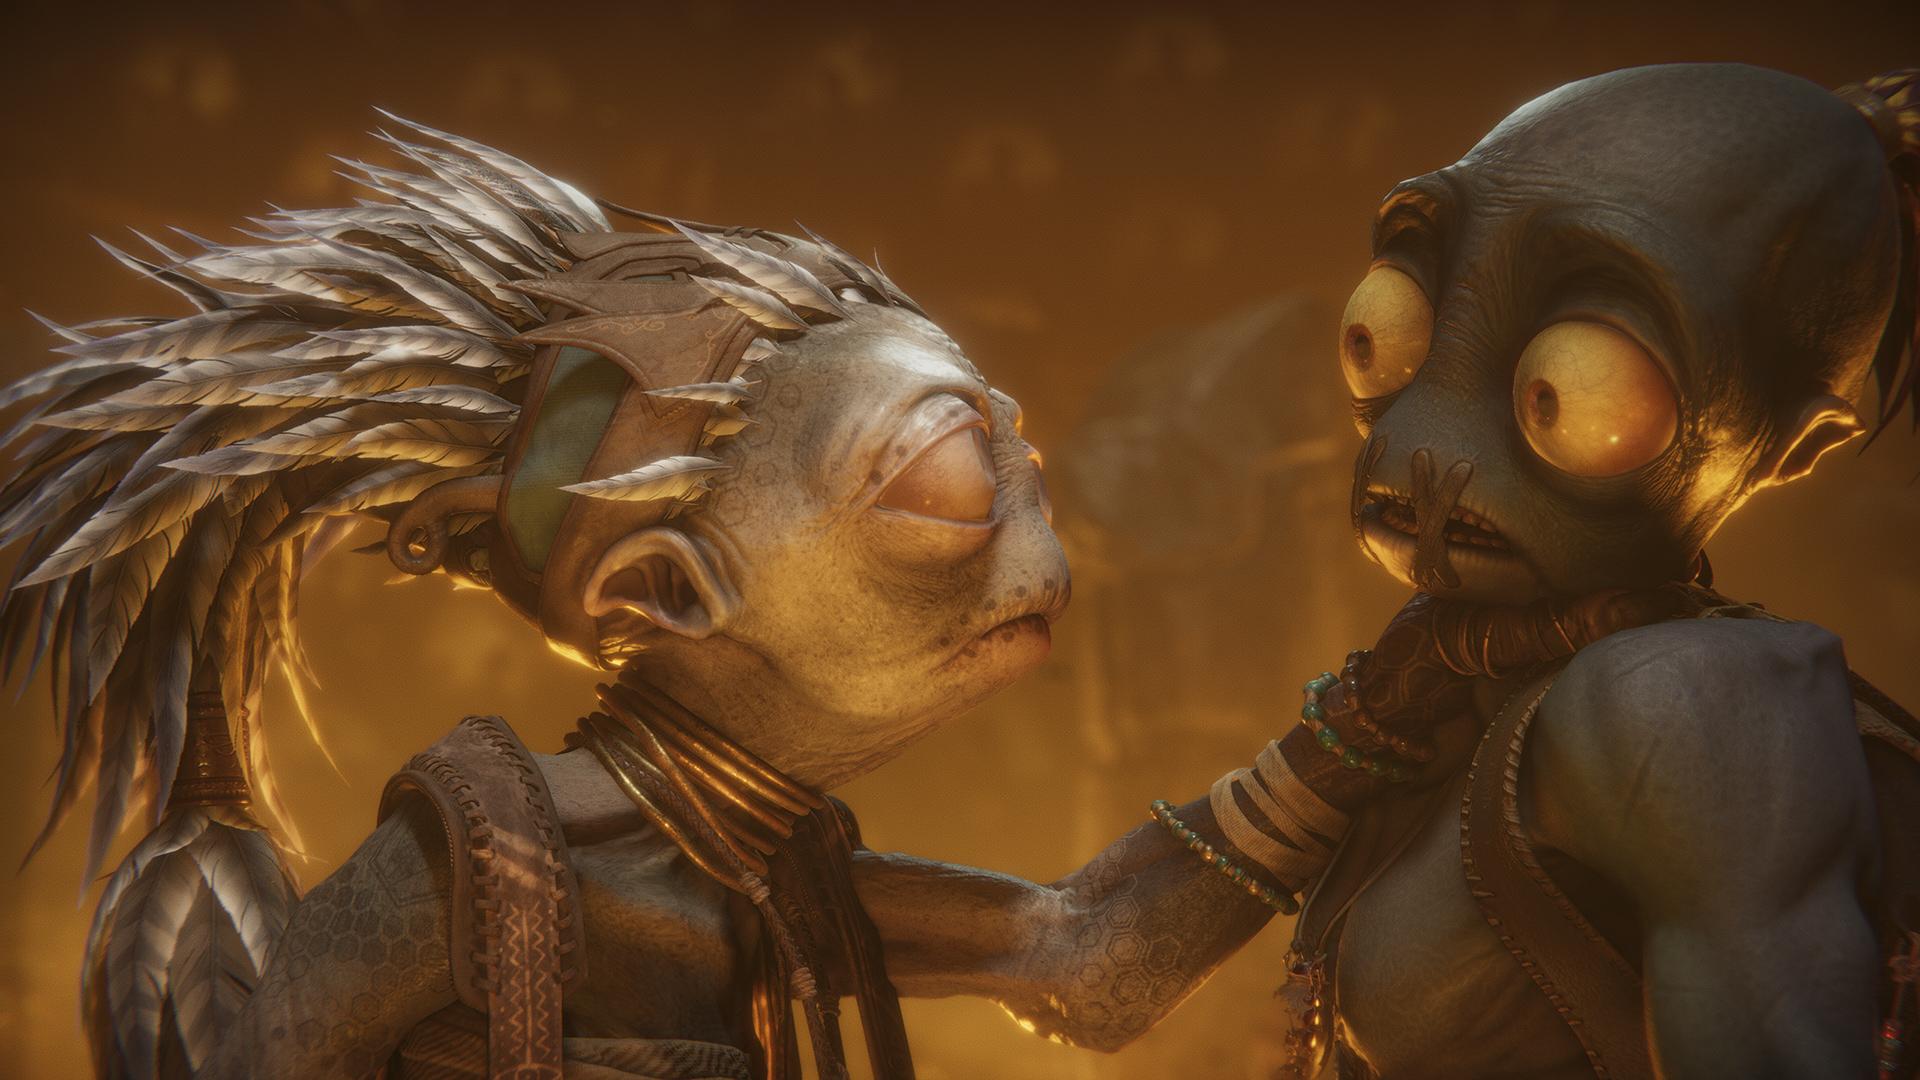 Oddworld Soulstorm captura de pantalla de presentación